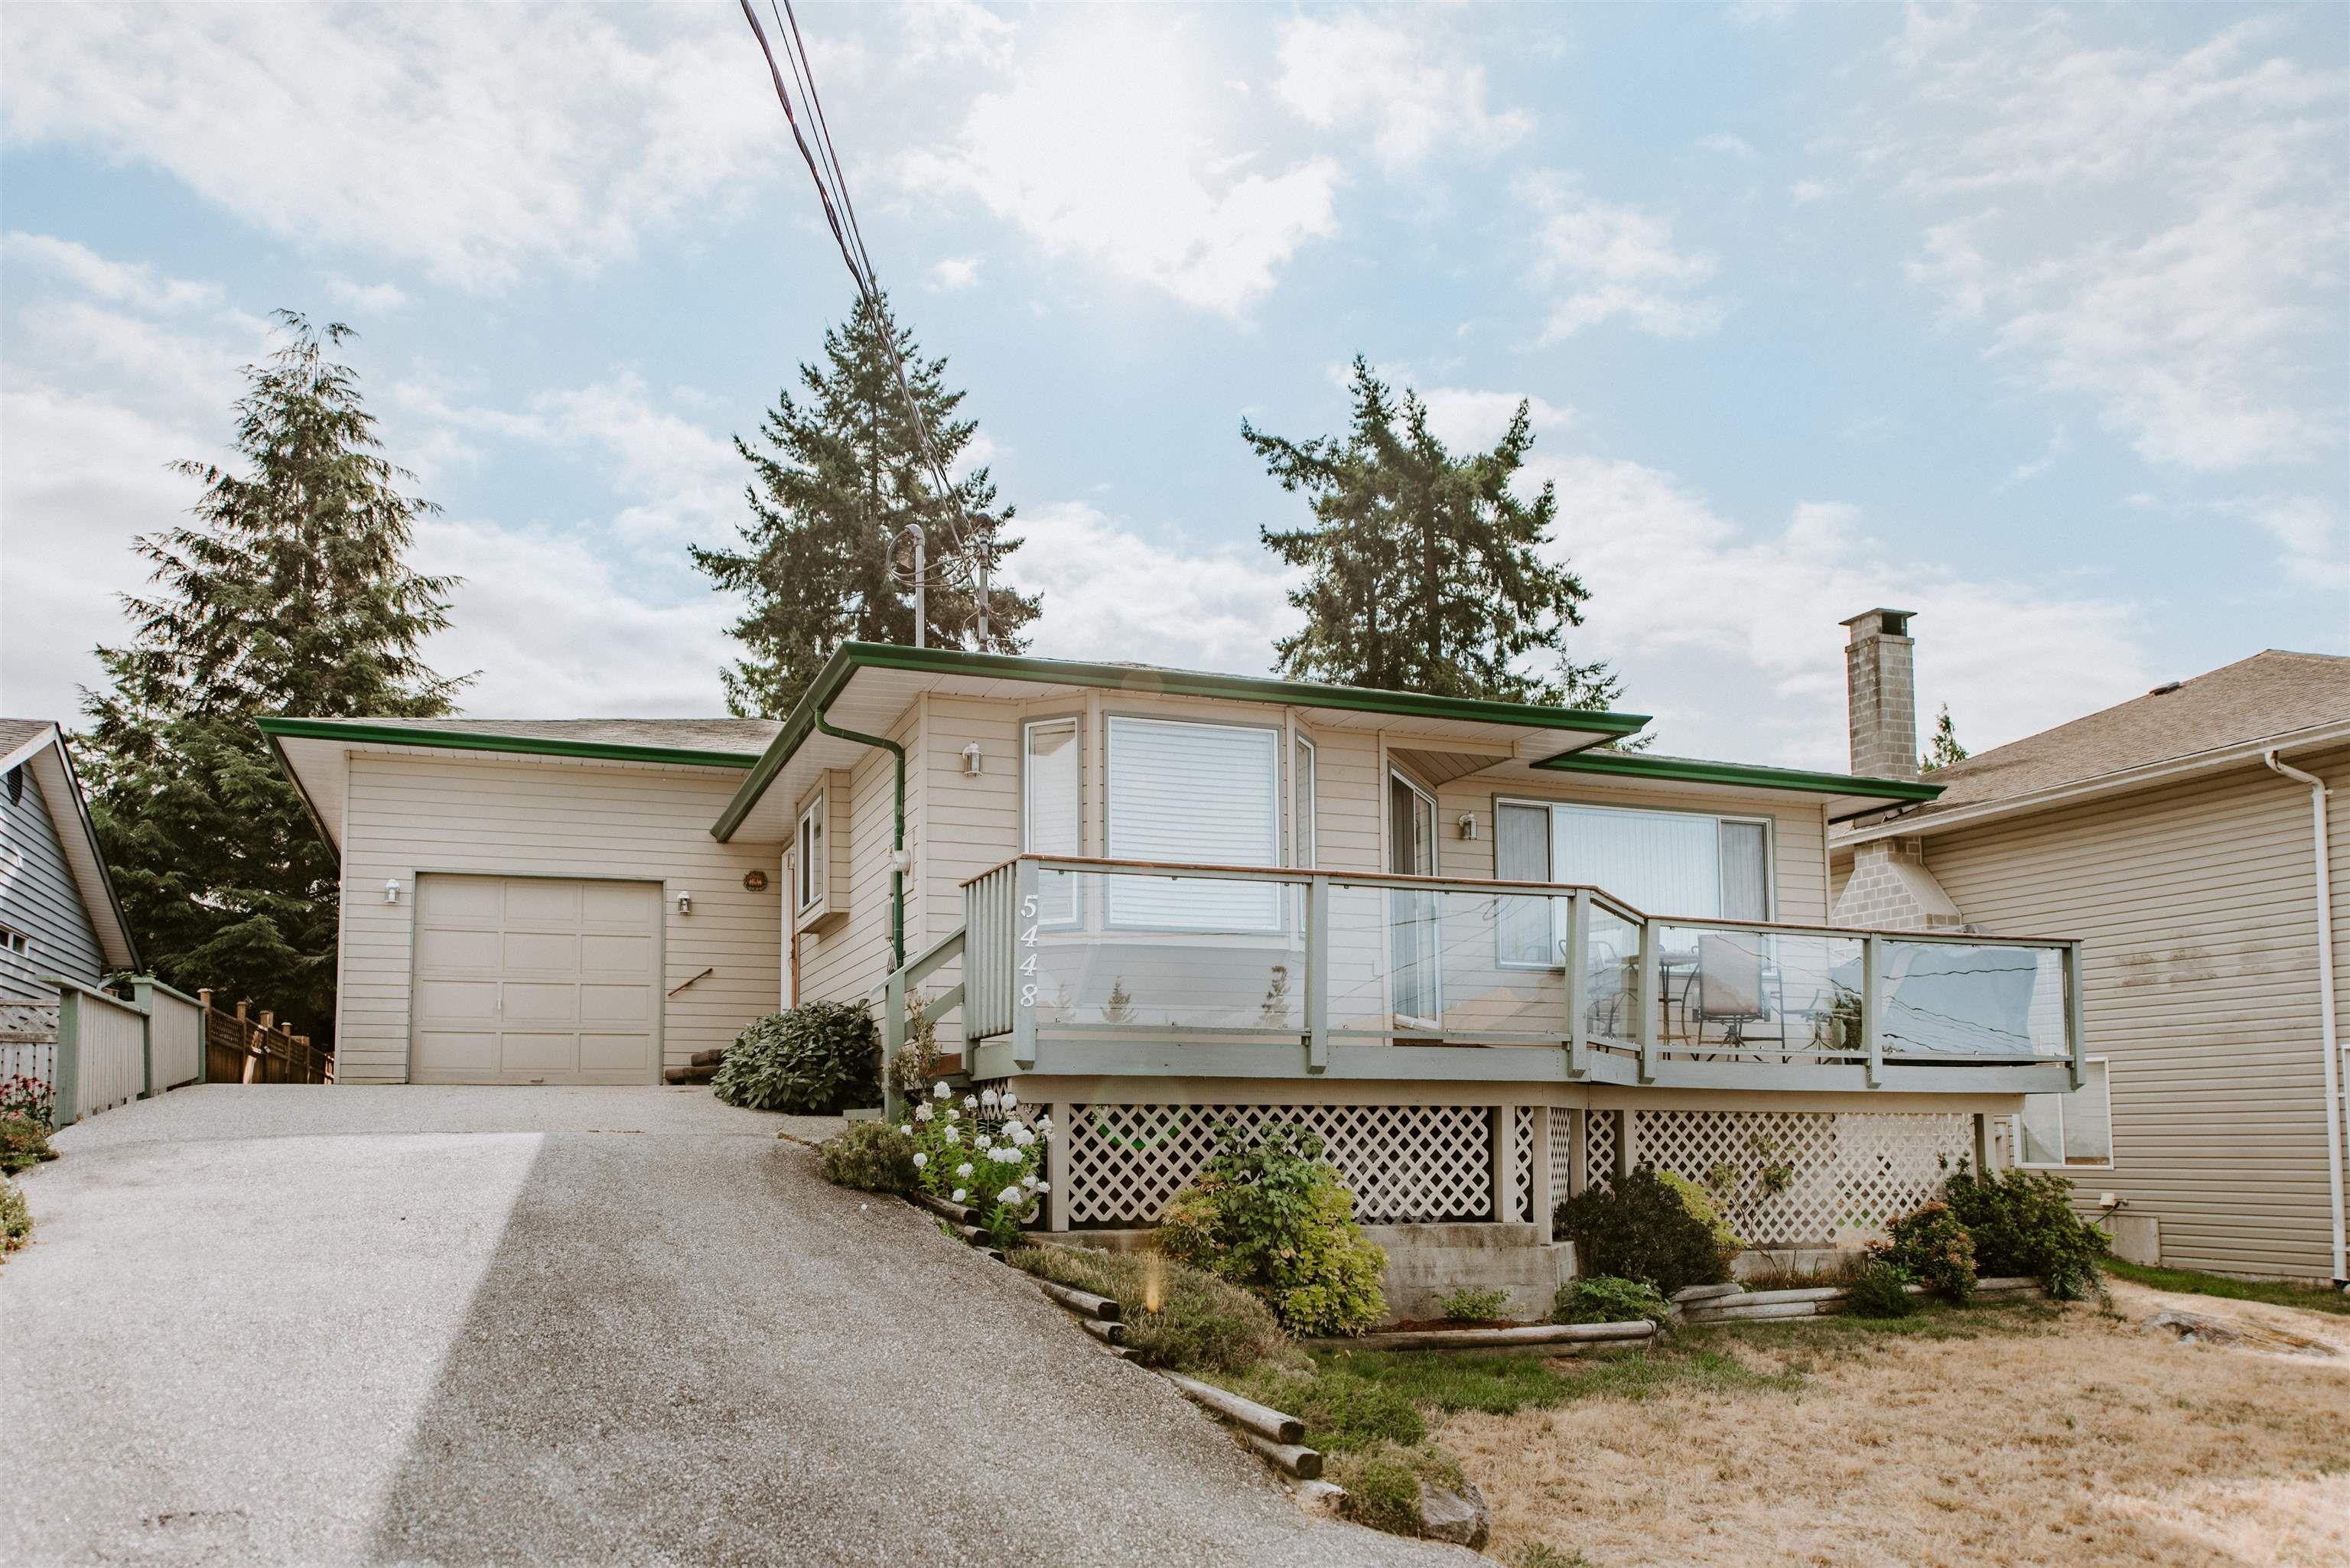 Main Photo: 5448 KENSINGTON Road in Sechelt: Sechelt District House for sale (Sunshine Coast)  : MLS®# R2611334